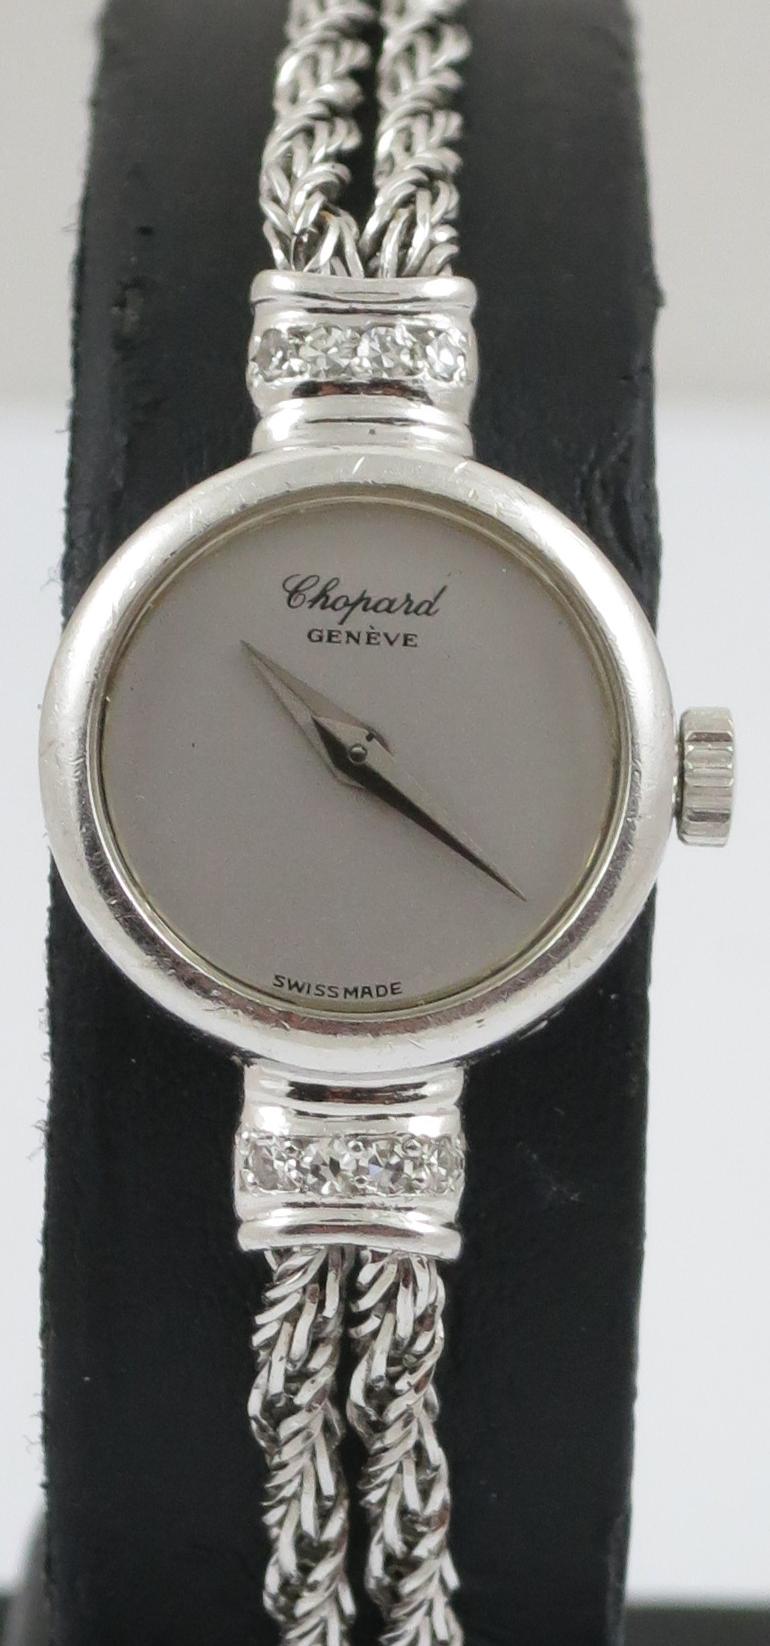 LADIES CHOPARD BY KUTCHINSKI 18CT WHITE GOLD AND DIAMOND SET MECHANICAL COCKTAIL WATCH